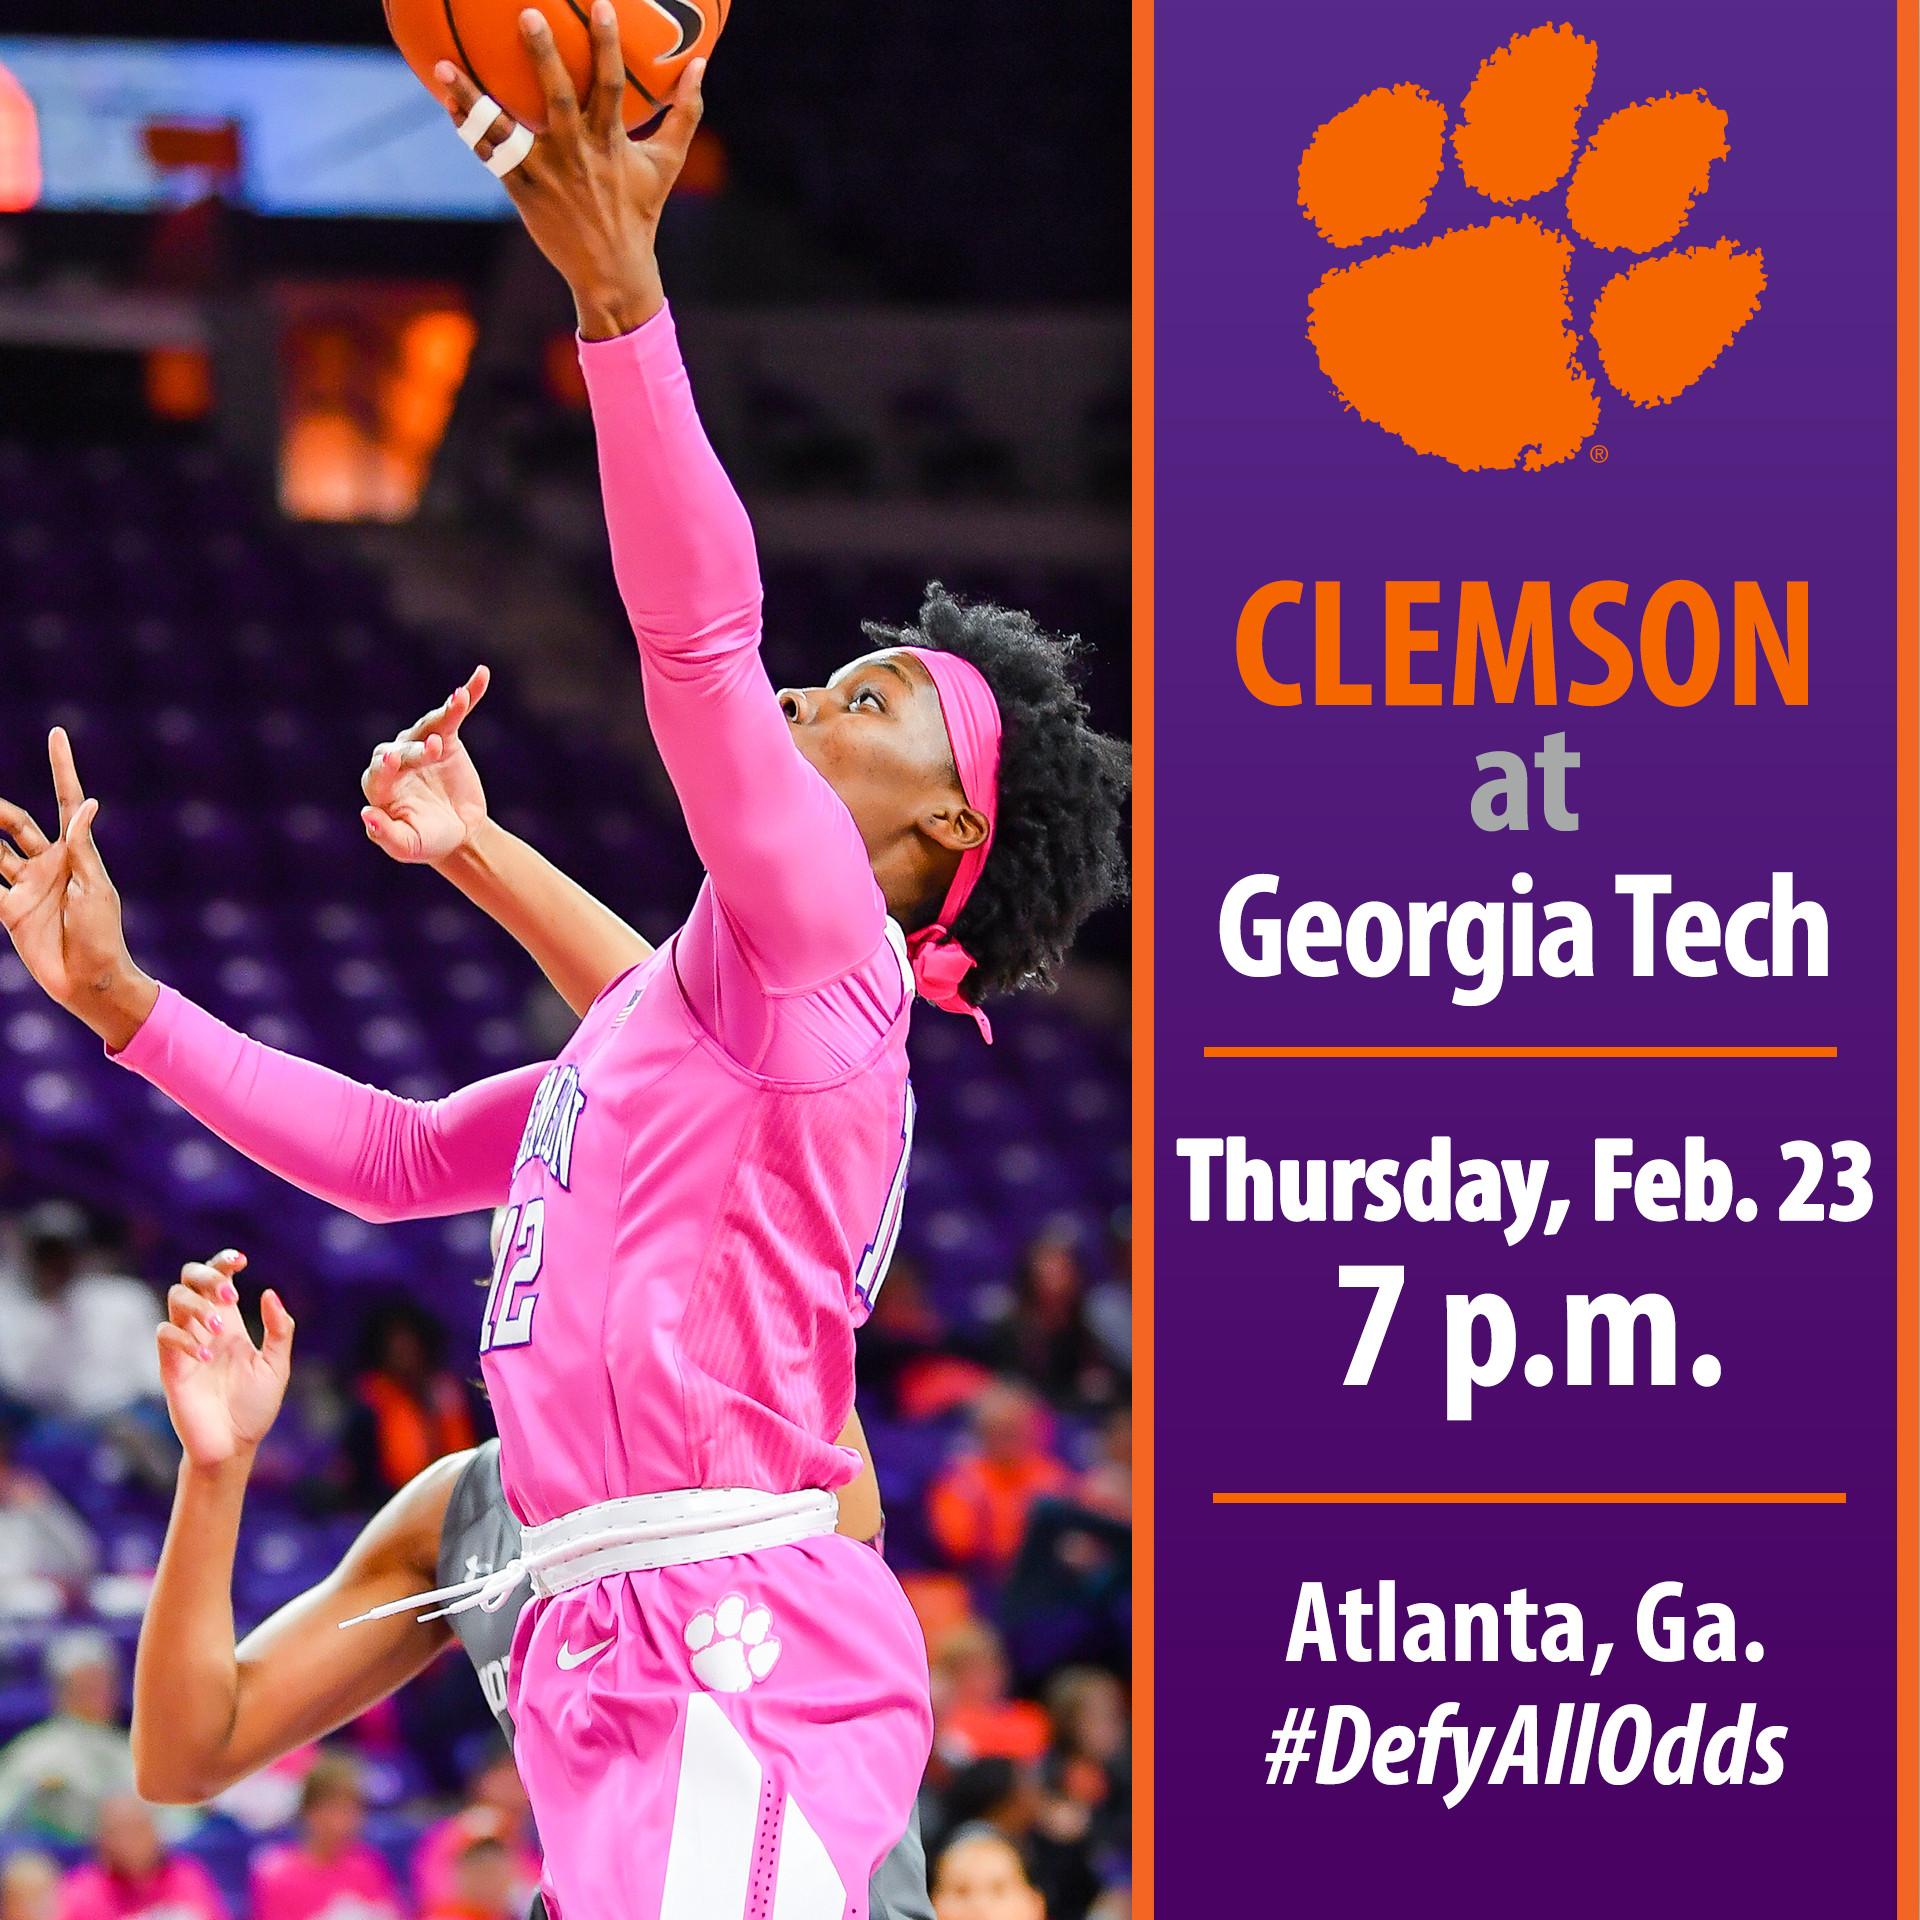 Clemson Concludes Regular Season Play at Georgia Tech Thursday